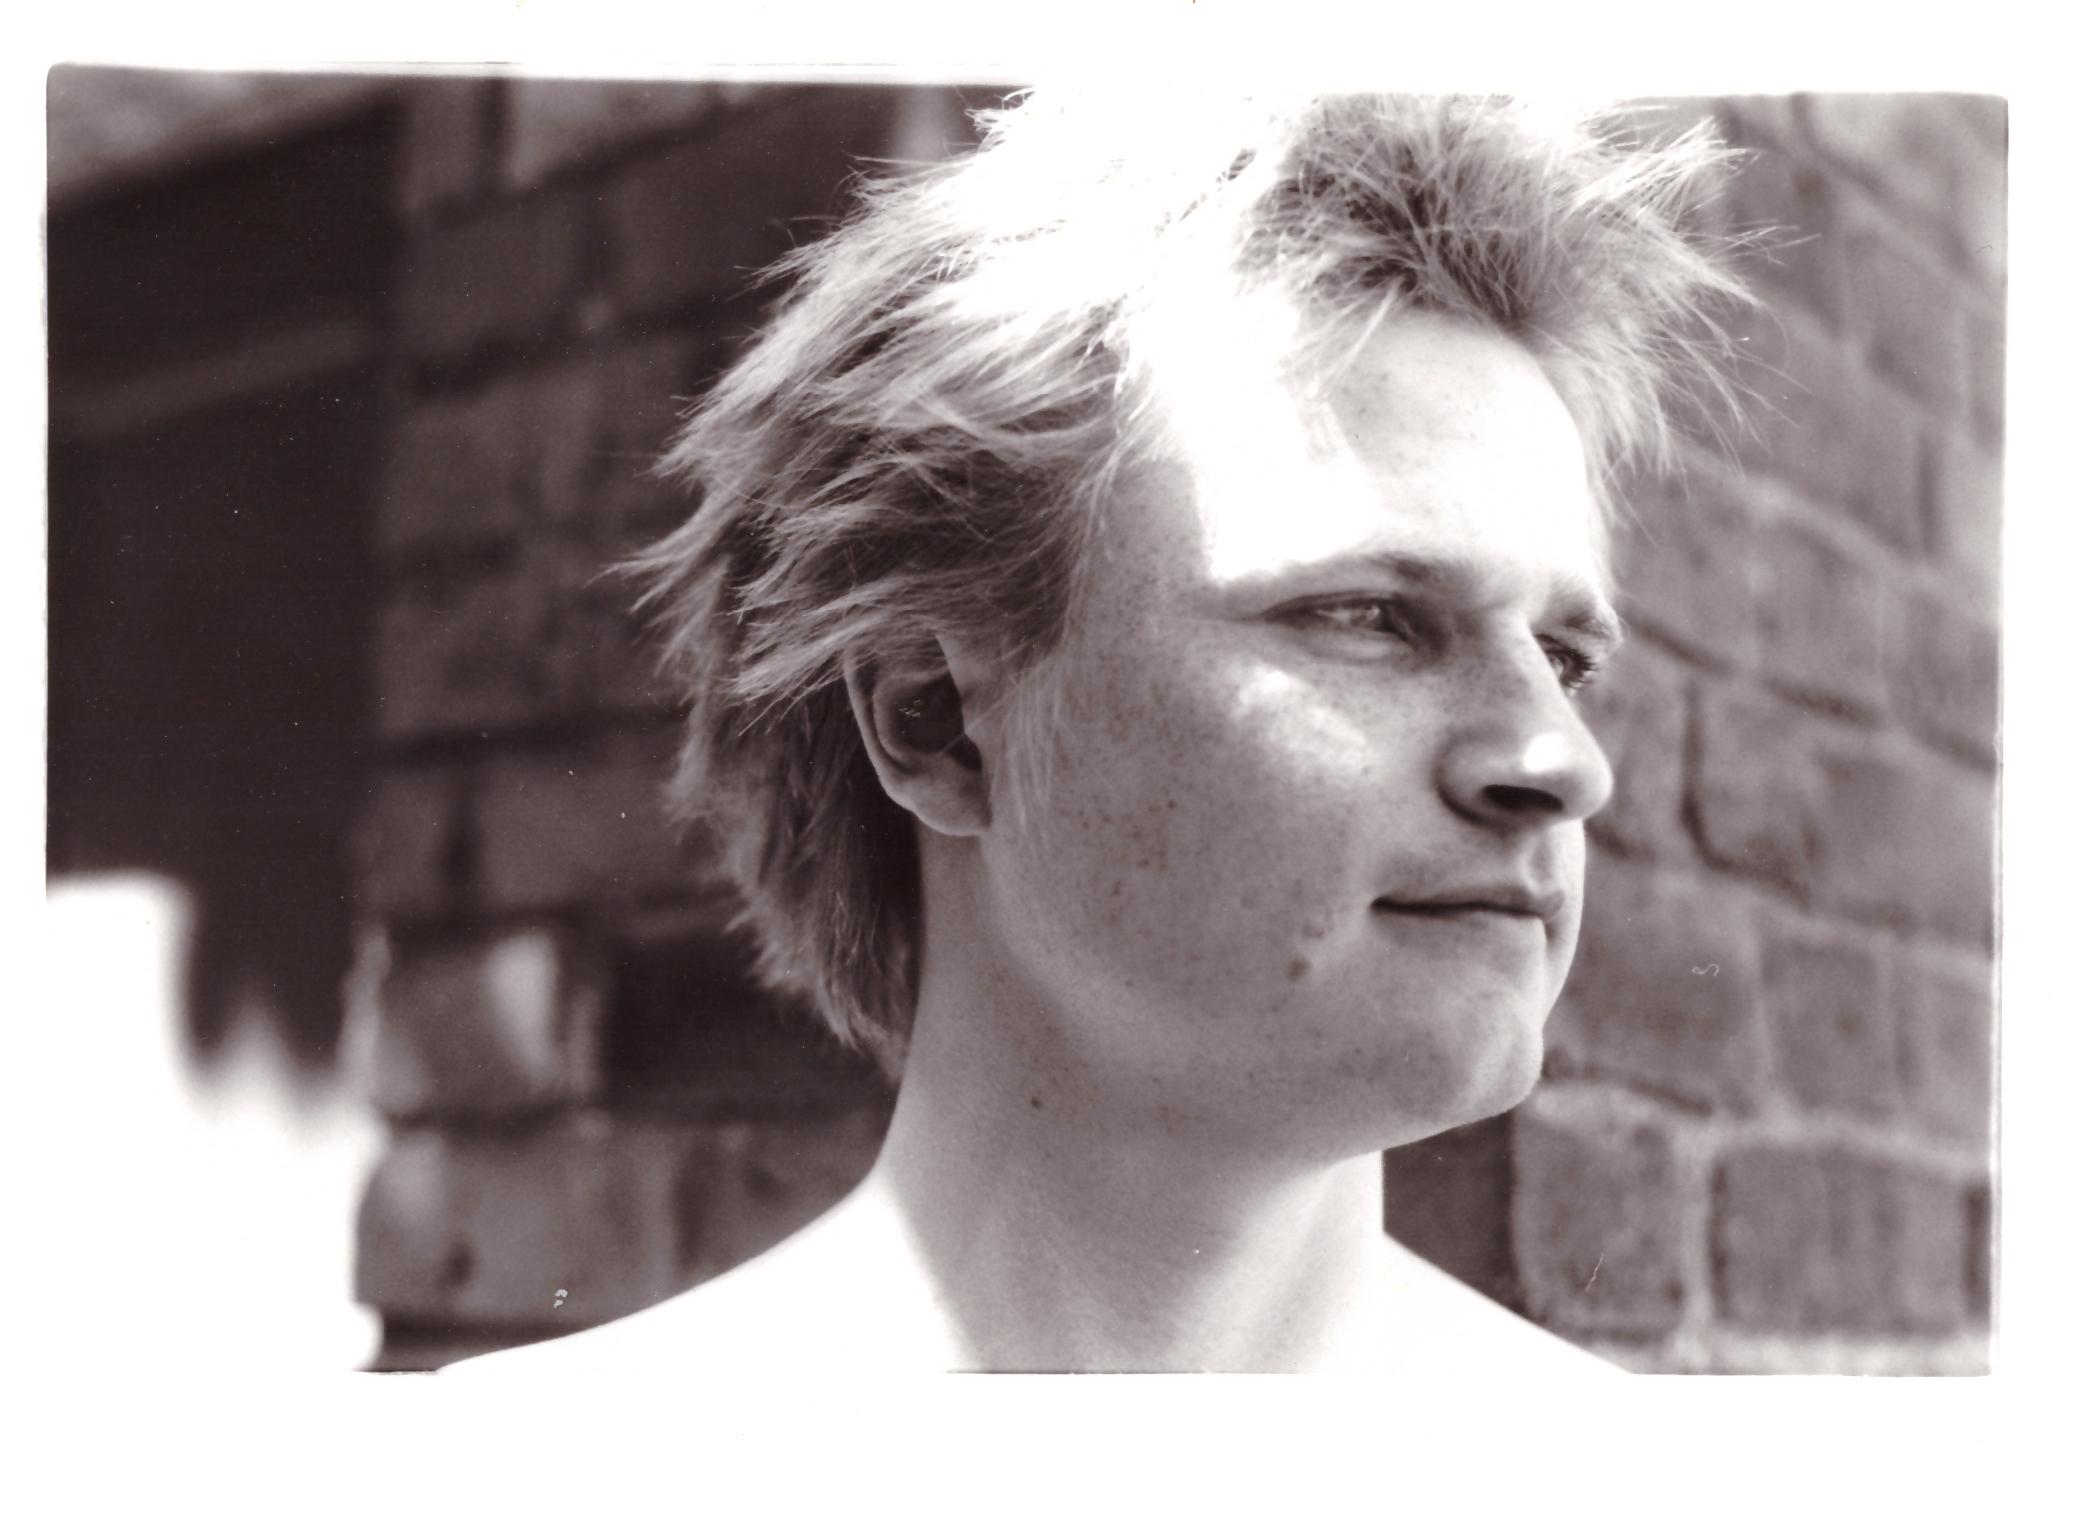 Fredrik Sandblom 1988